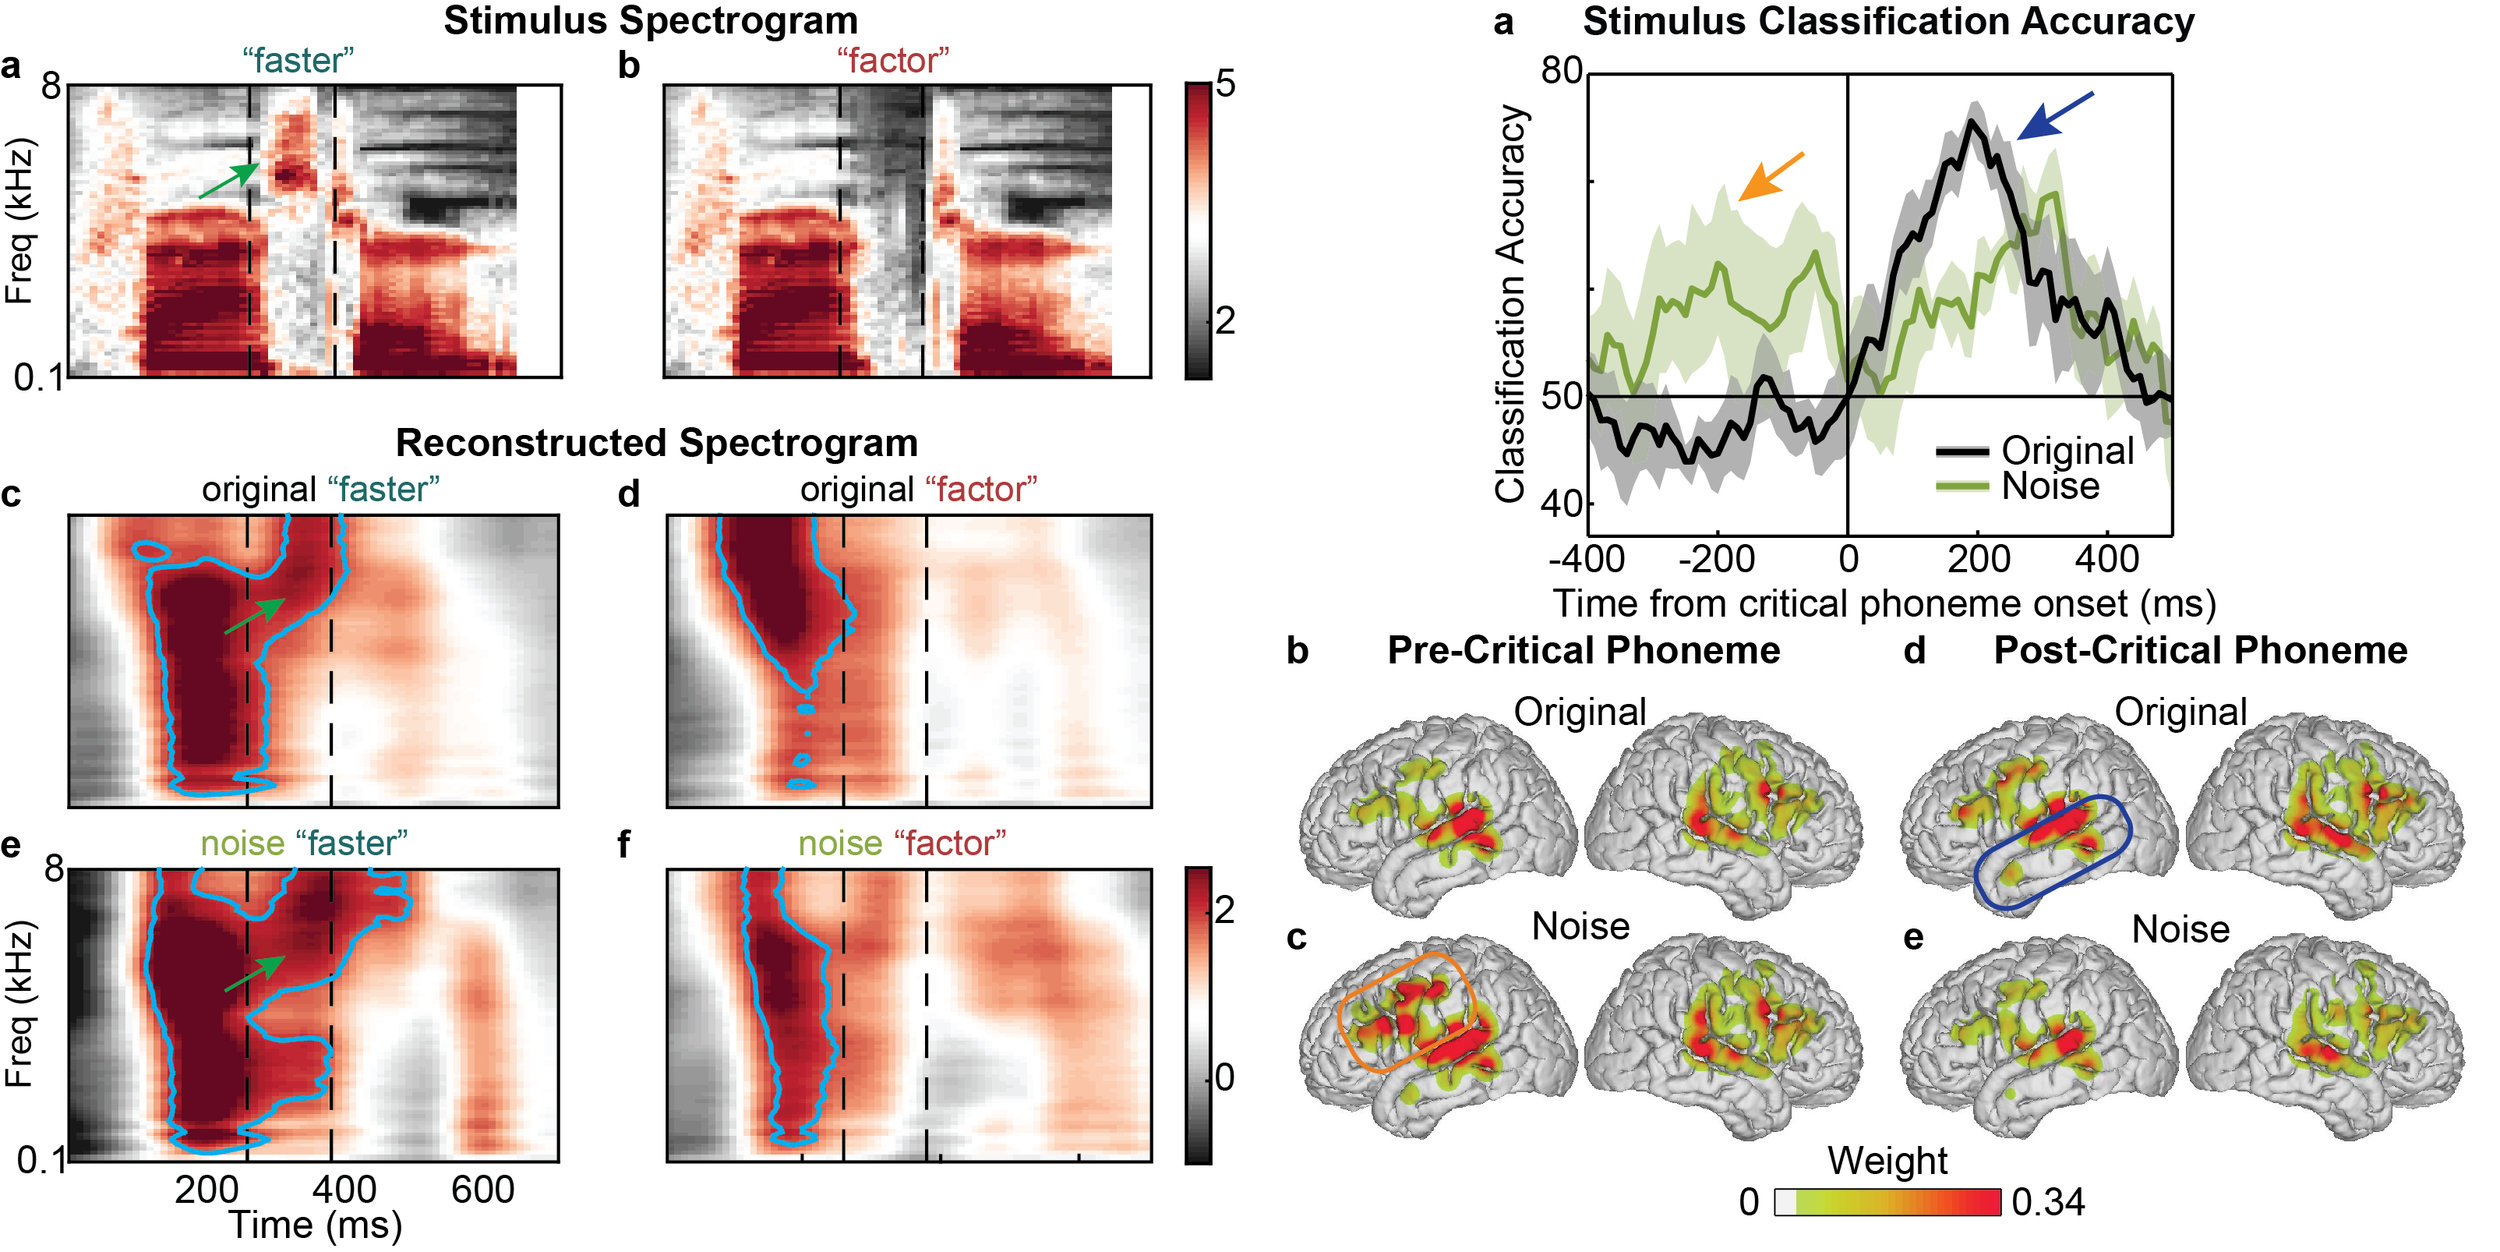 Leonard, M.K., Baud, M.O., Sjerps, M.J., & Chang, E.F. (2016). Perceptual restoration of masked speech in human cortex . Nature Communications ,13619. doi:10.1038/ncomms13619.